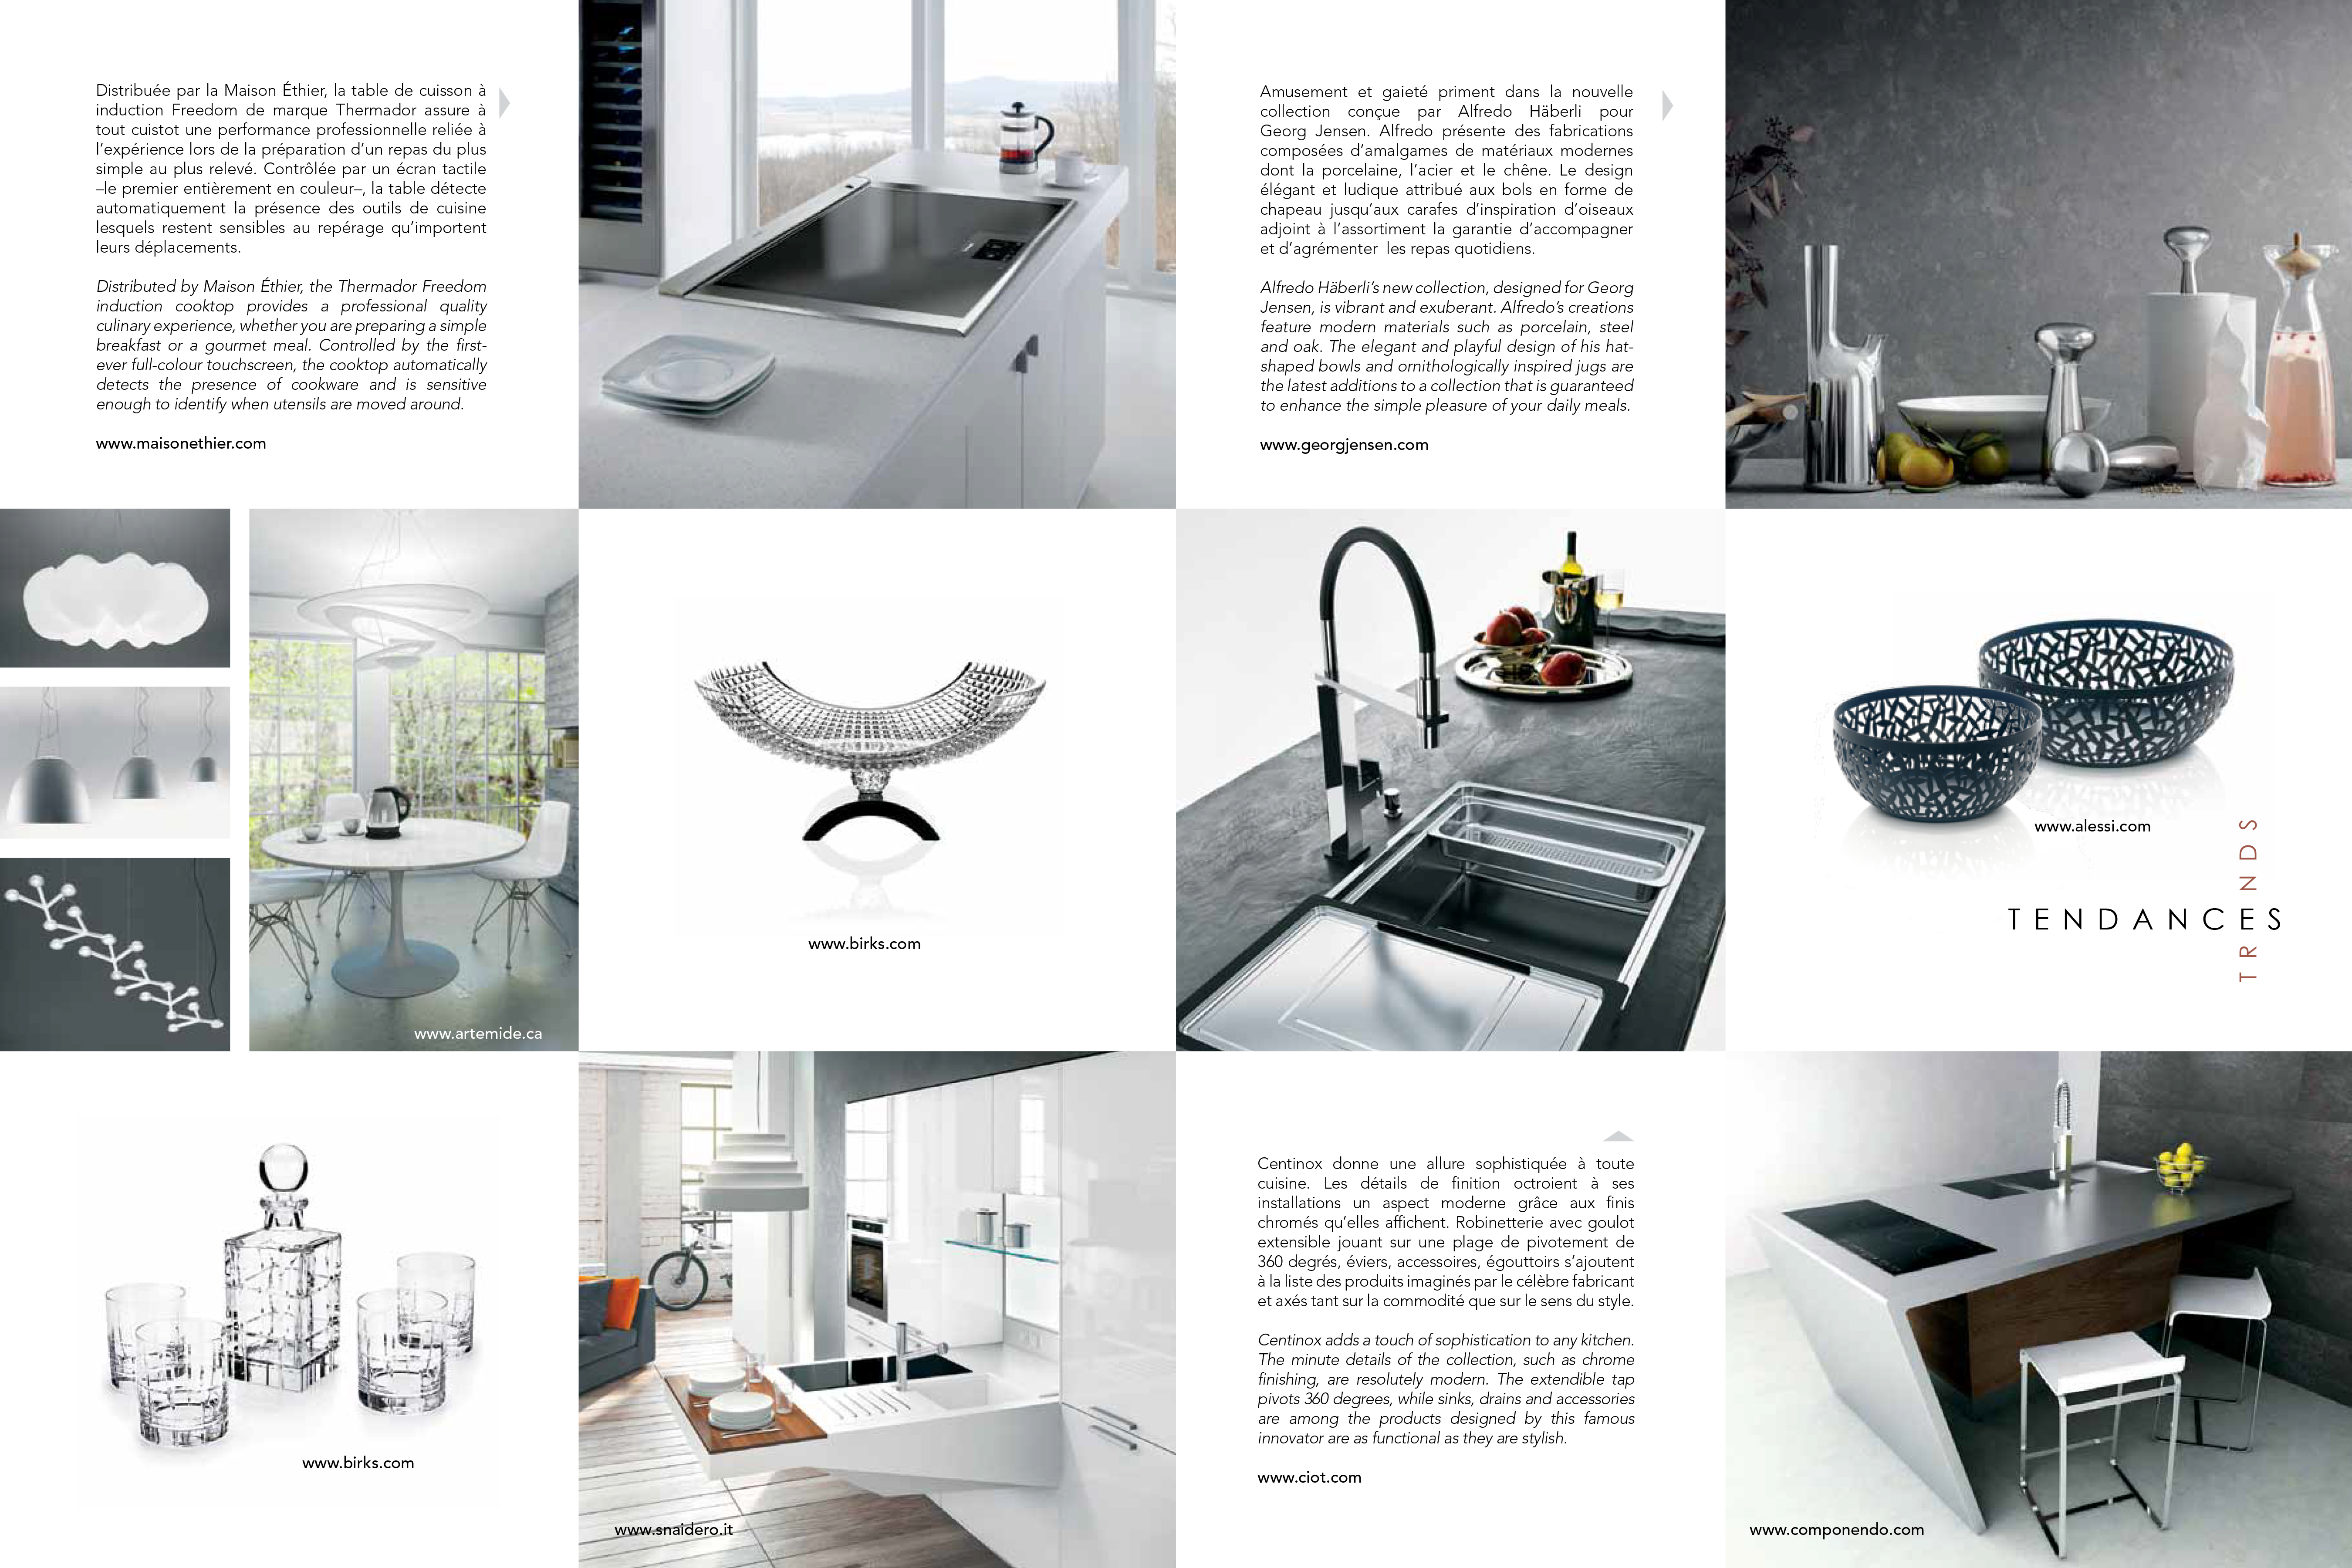 2012 Prestige design magazine | Tendances Cuisines | KITCHEN TRENDS ...